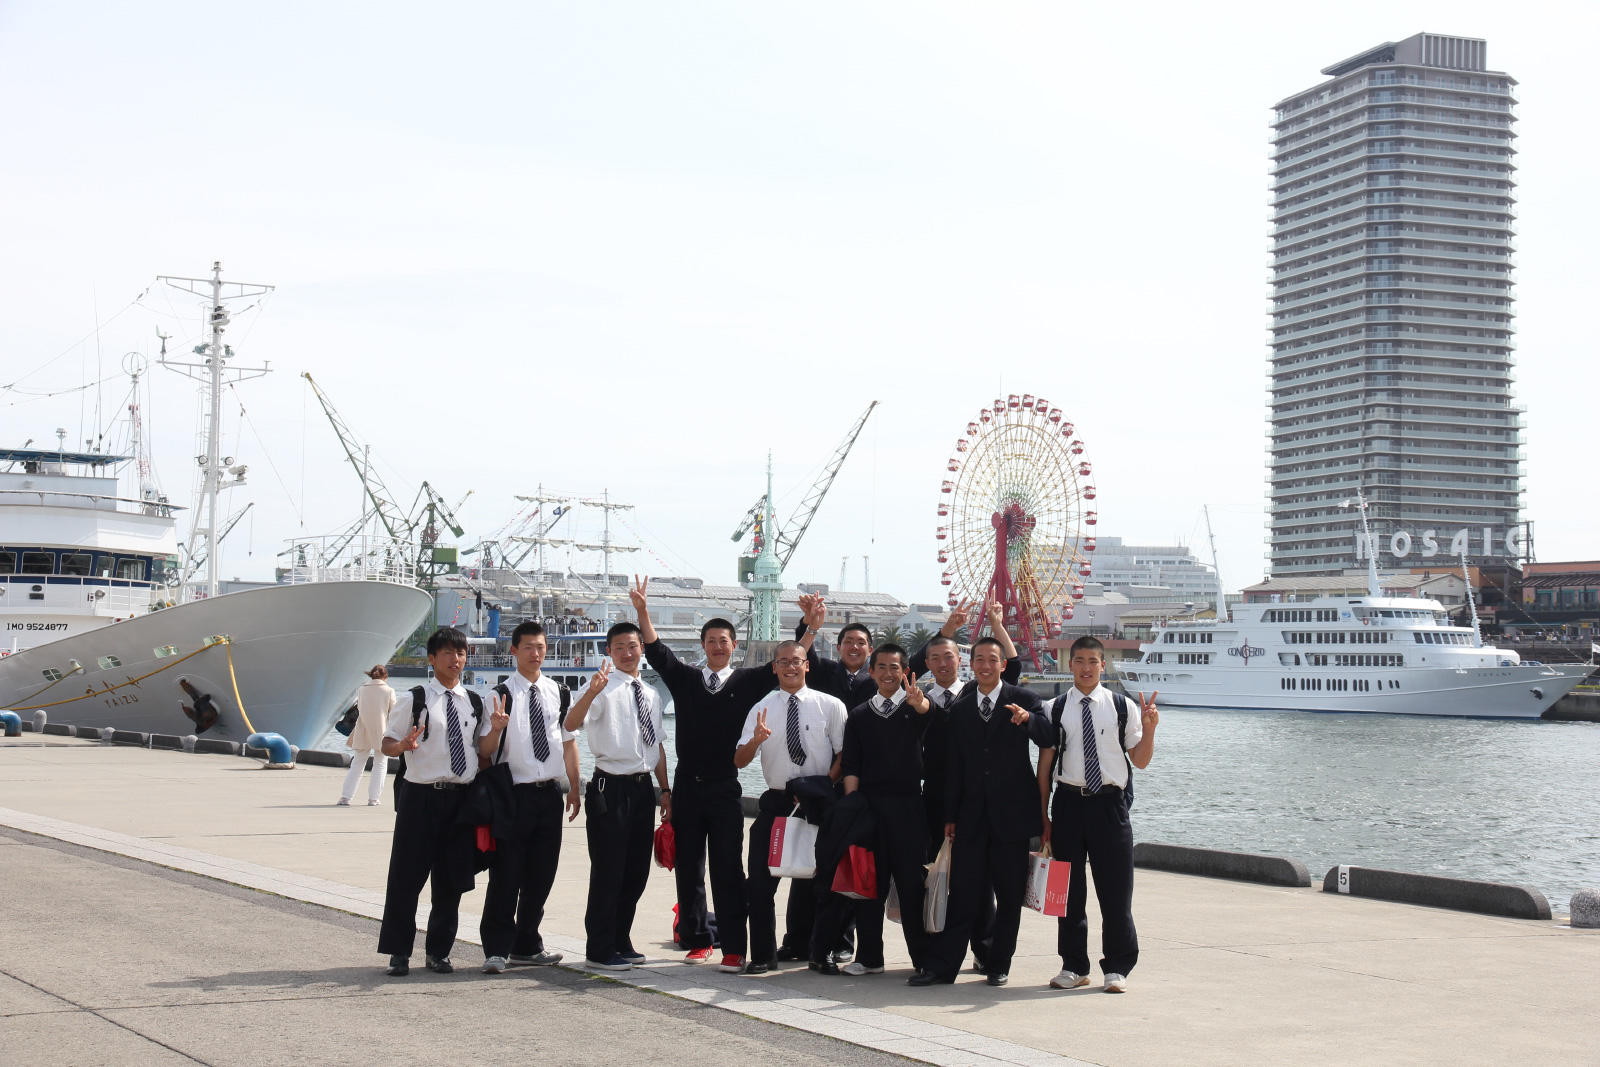 http://www.kyoto-be.ne.jp/nishijyouyou-hs/mt/schoollife/images/20170425_3nen_img_2460.jpg